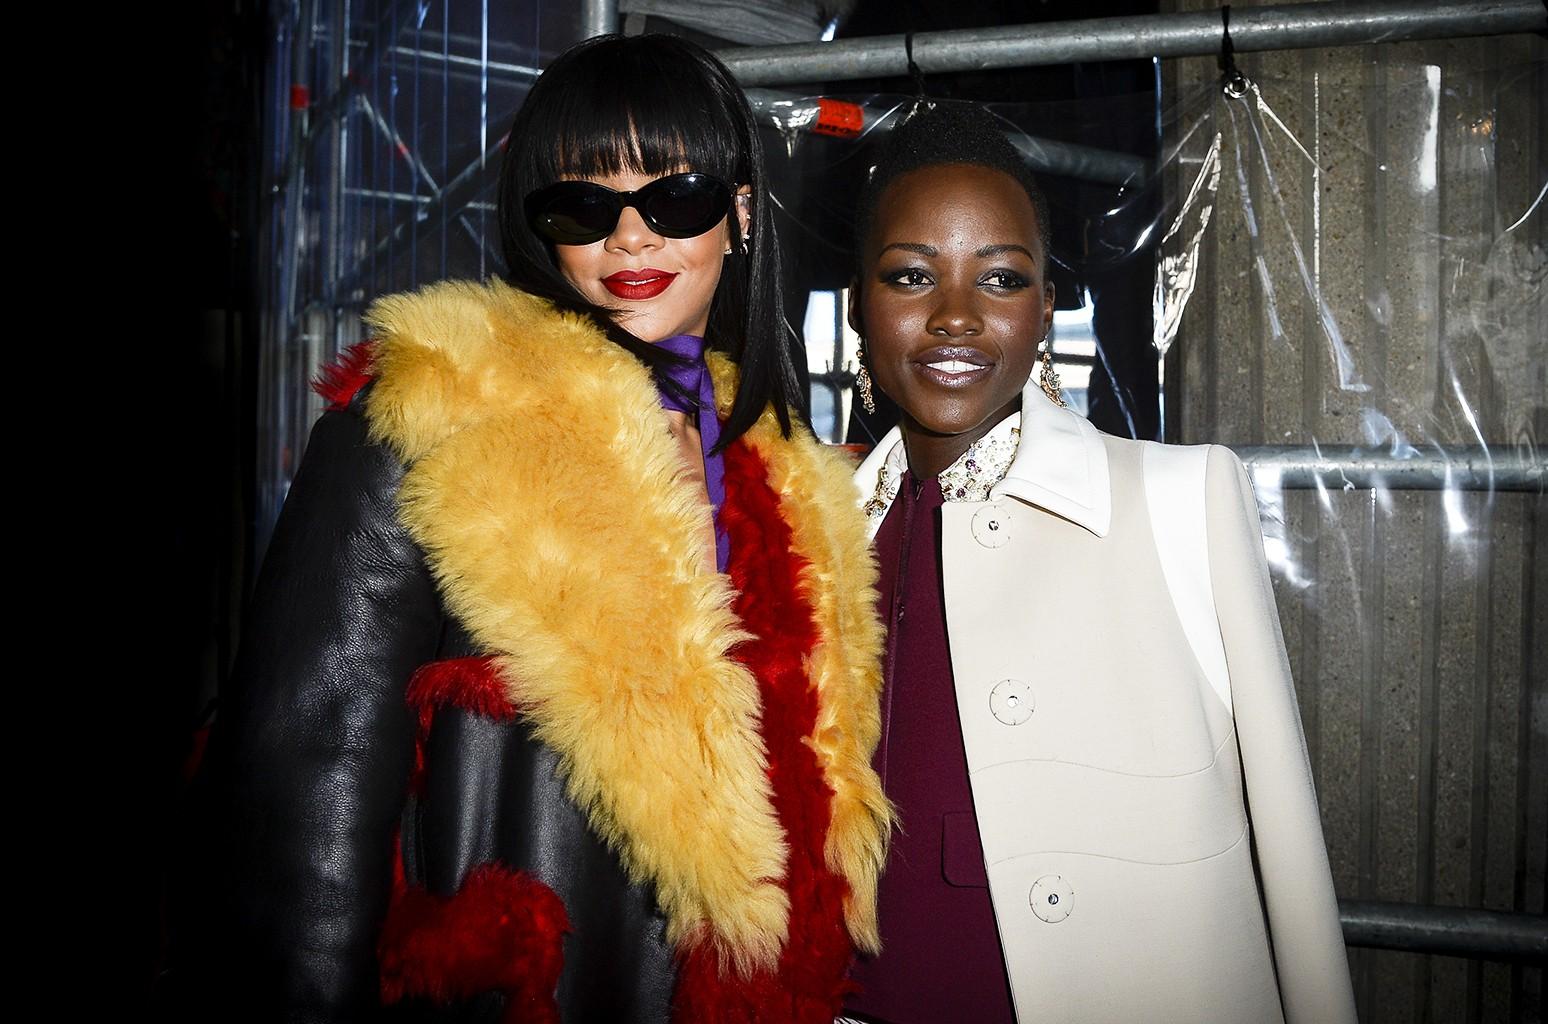 Rihanna and Lupita Nyong'o attend the Miu Miu show as part of the Paris Fashion Week Womenswear Fall/Winter 2014-2015 on March 5, 2014 in Paris.